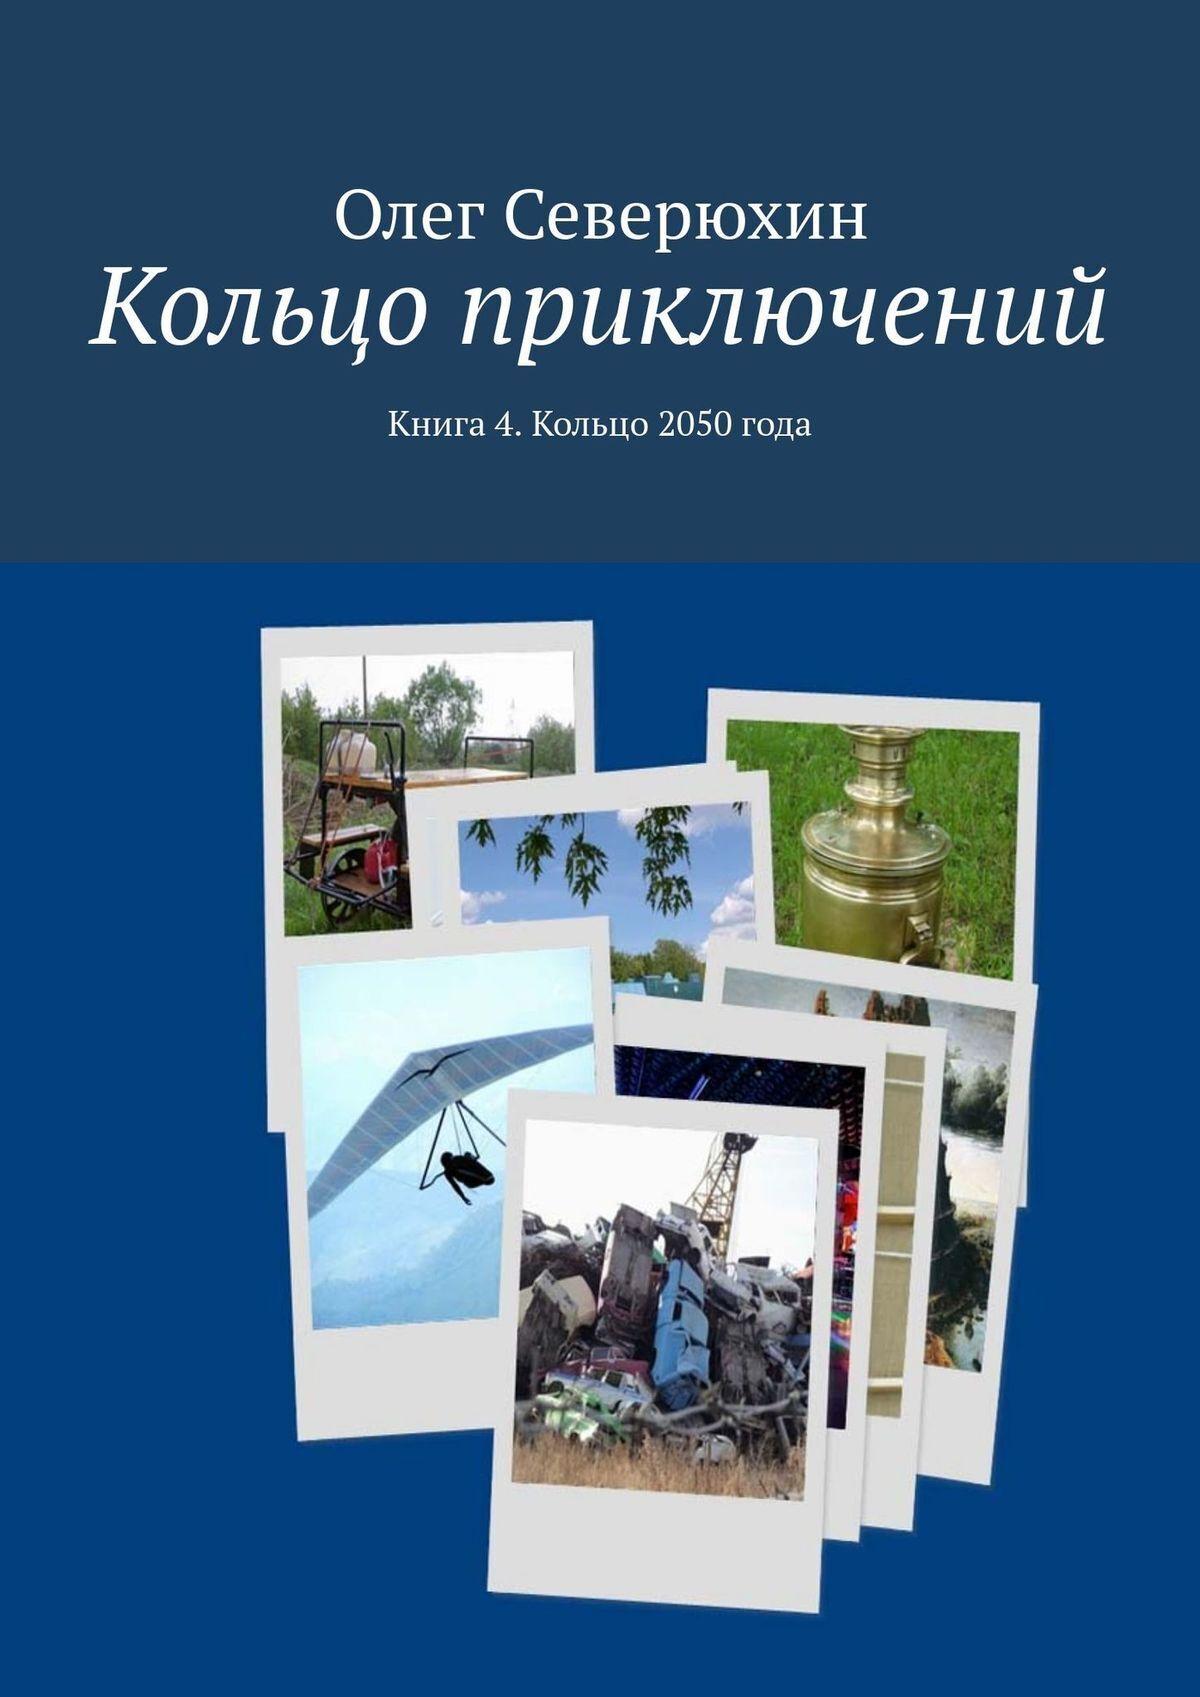 Олег Васильевич Северюхин Кольцо приключений. Книга4. Кольцо 2050года цена